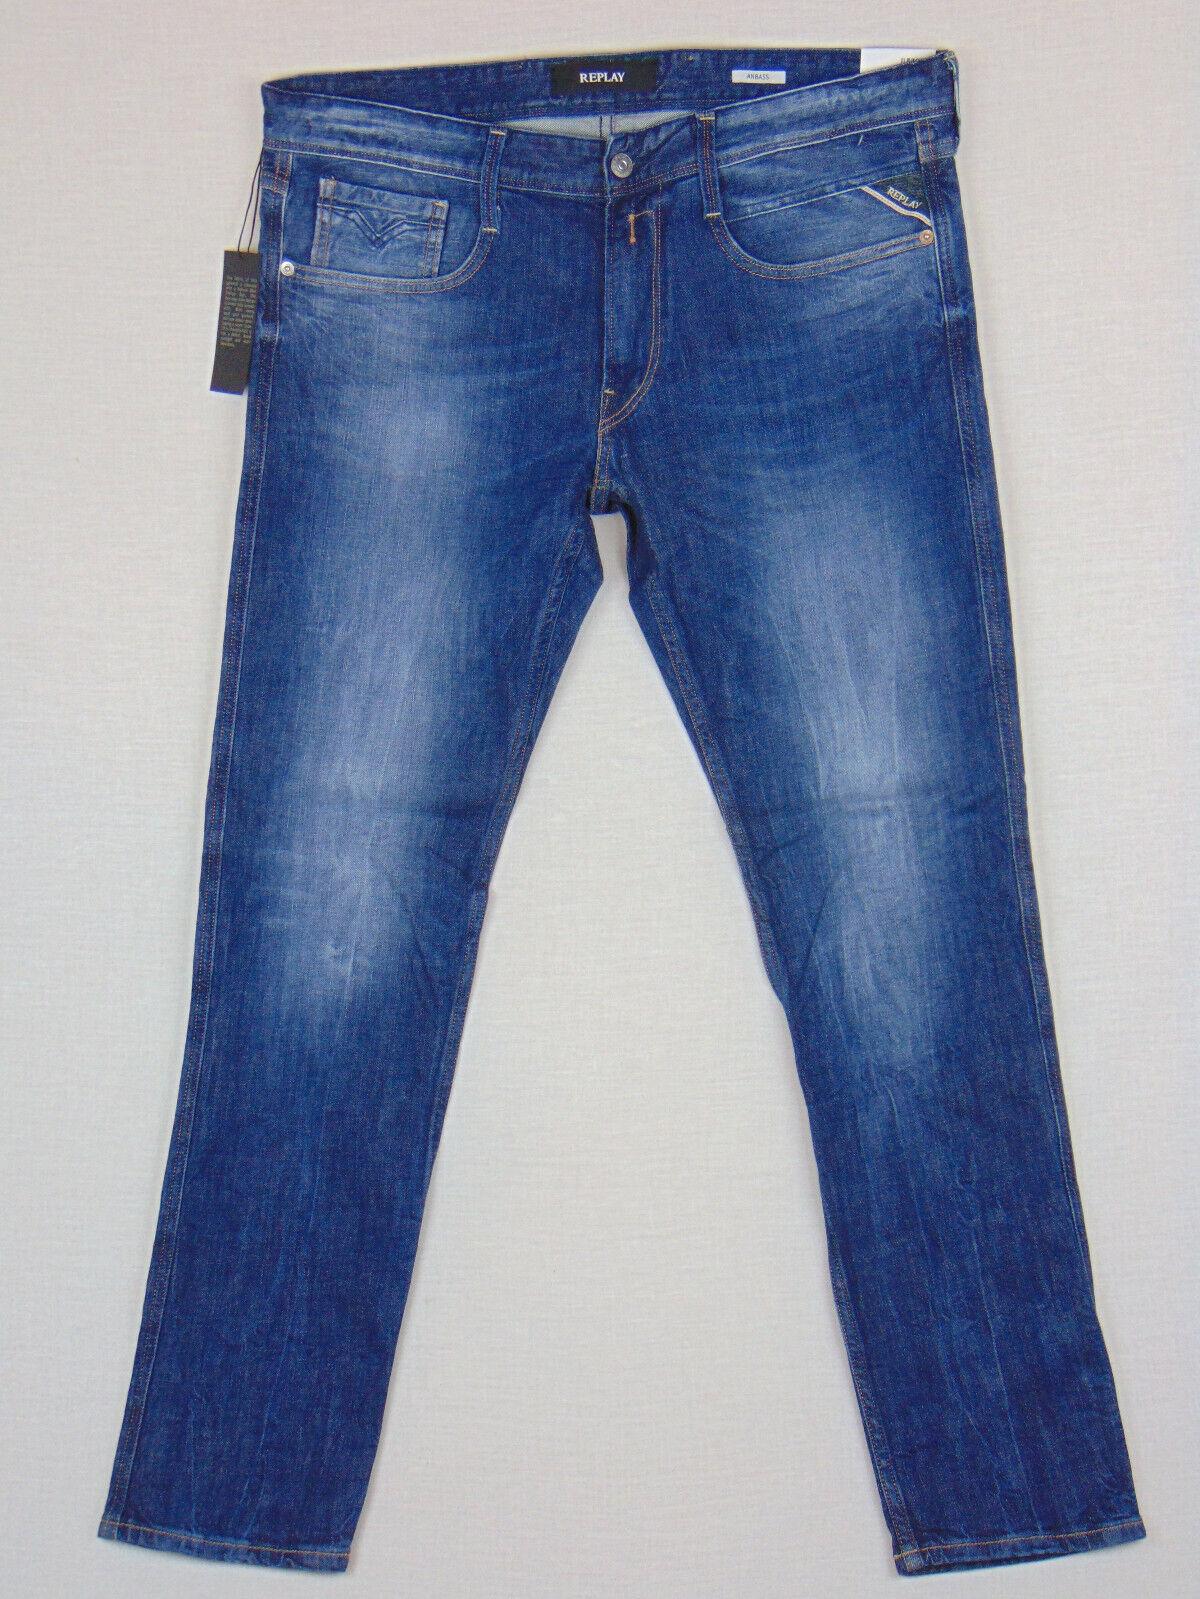 Replay ANBASS Slim Fit  W34 L32     Mens Blau Comfort Denim Jeans